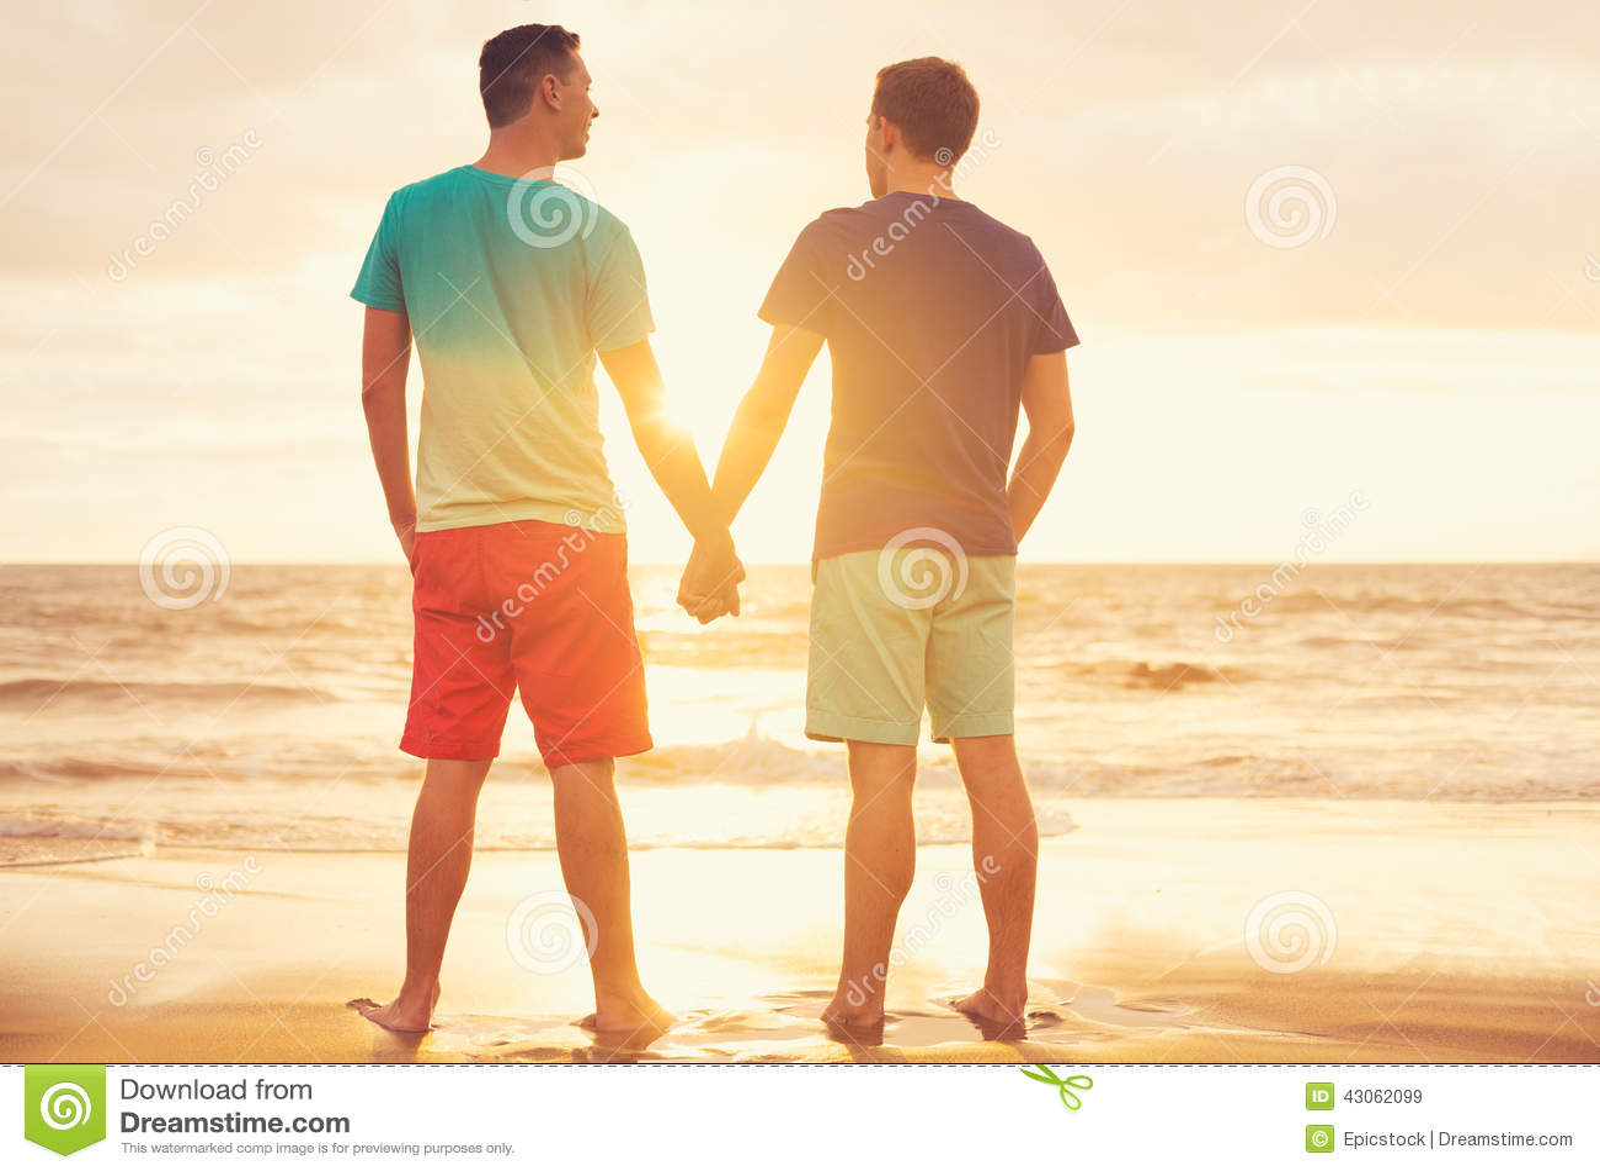 On the beach Happy gay couple